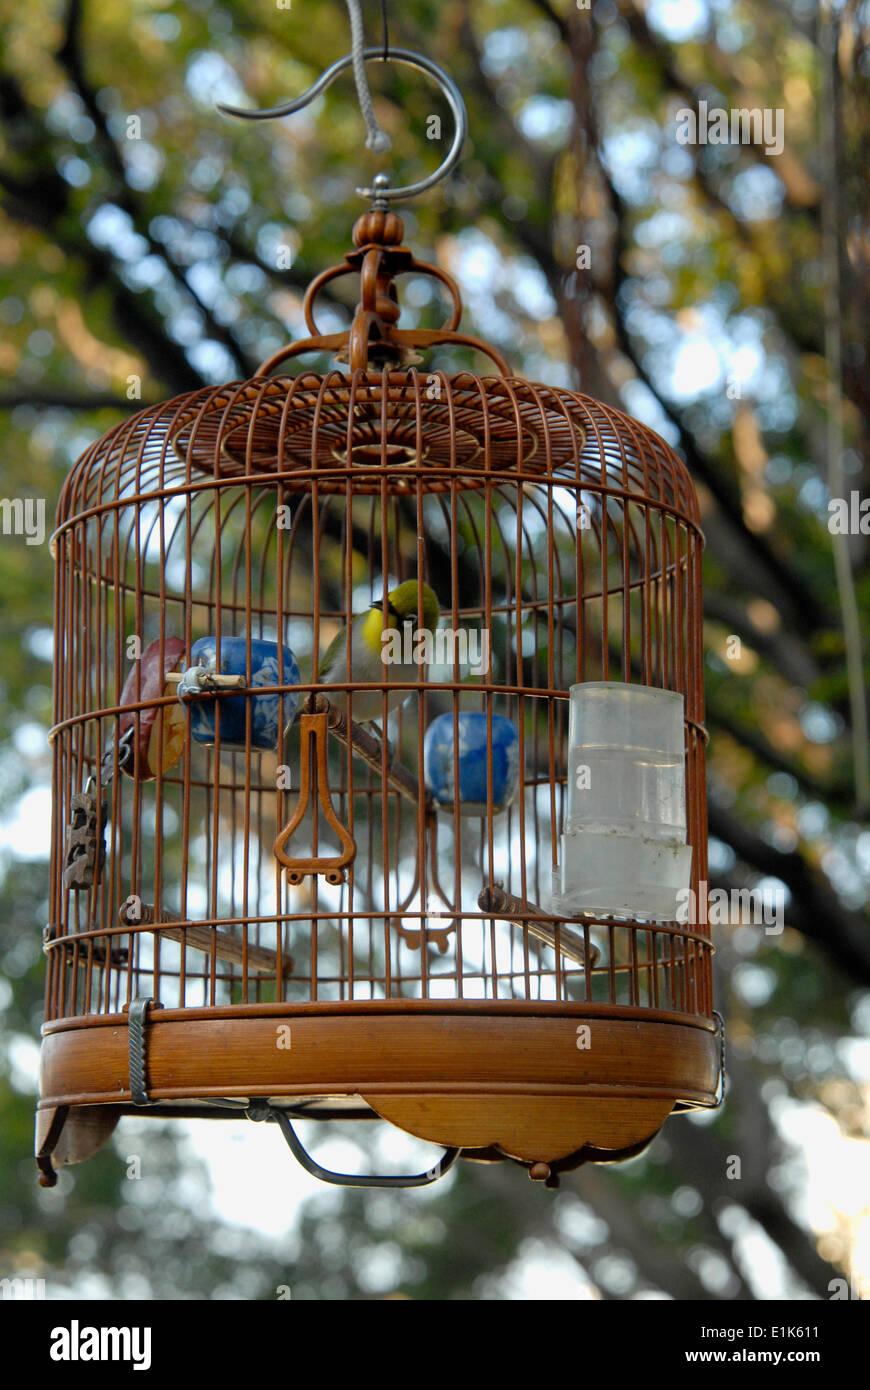 Bird singing contest - Stock Image